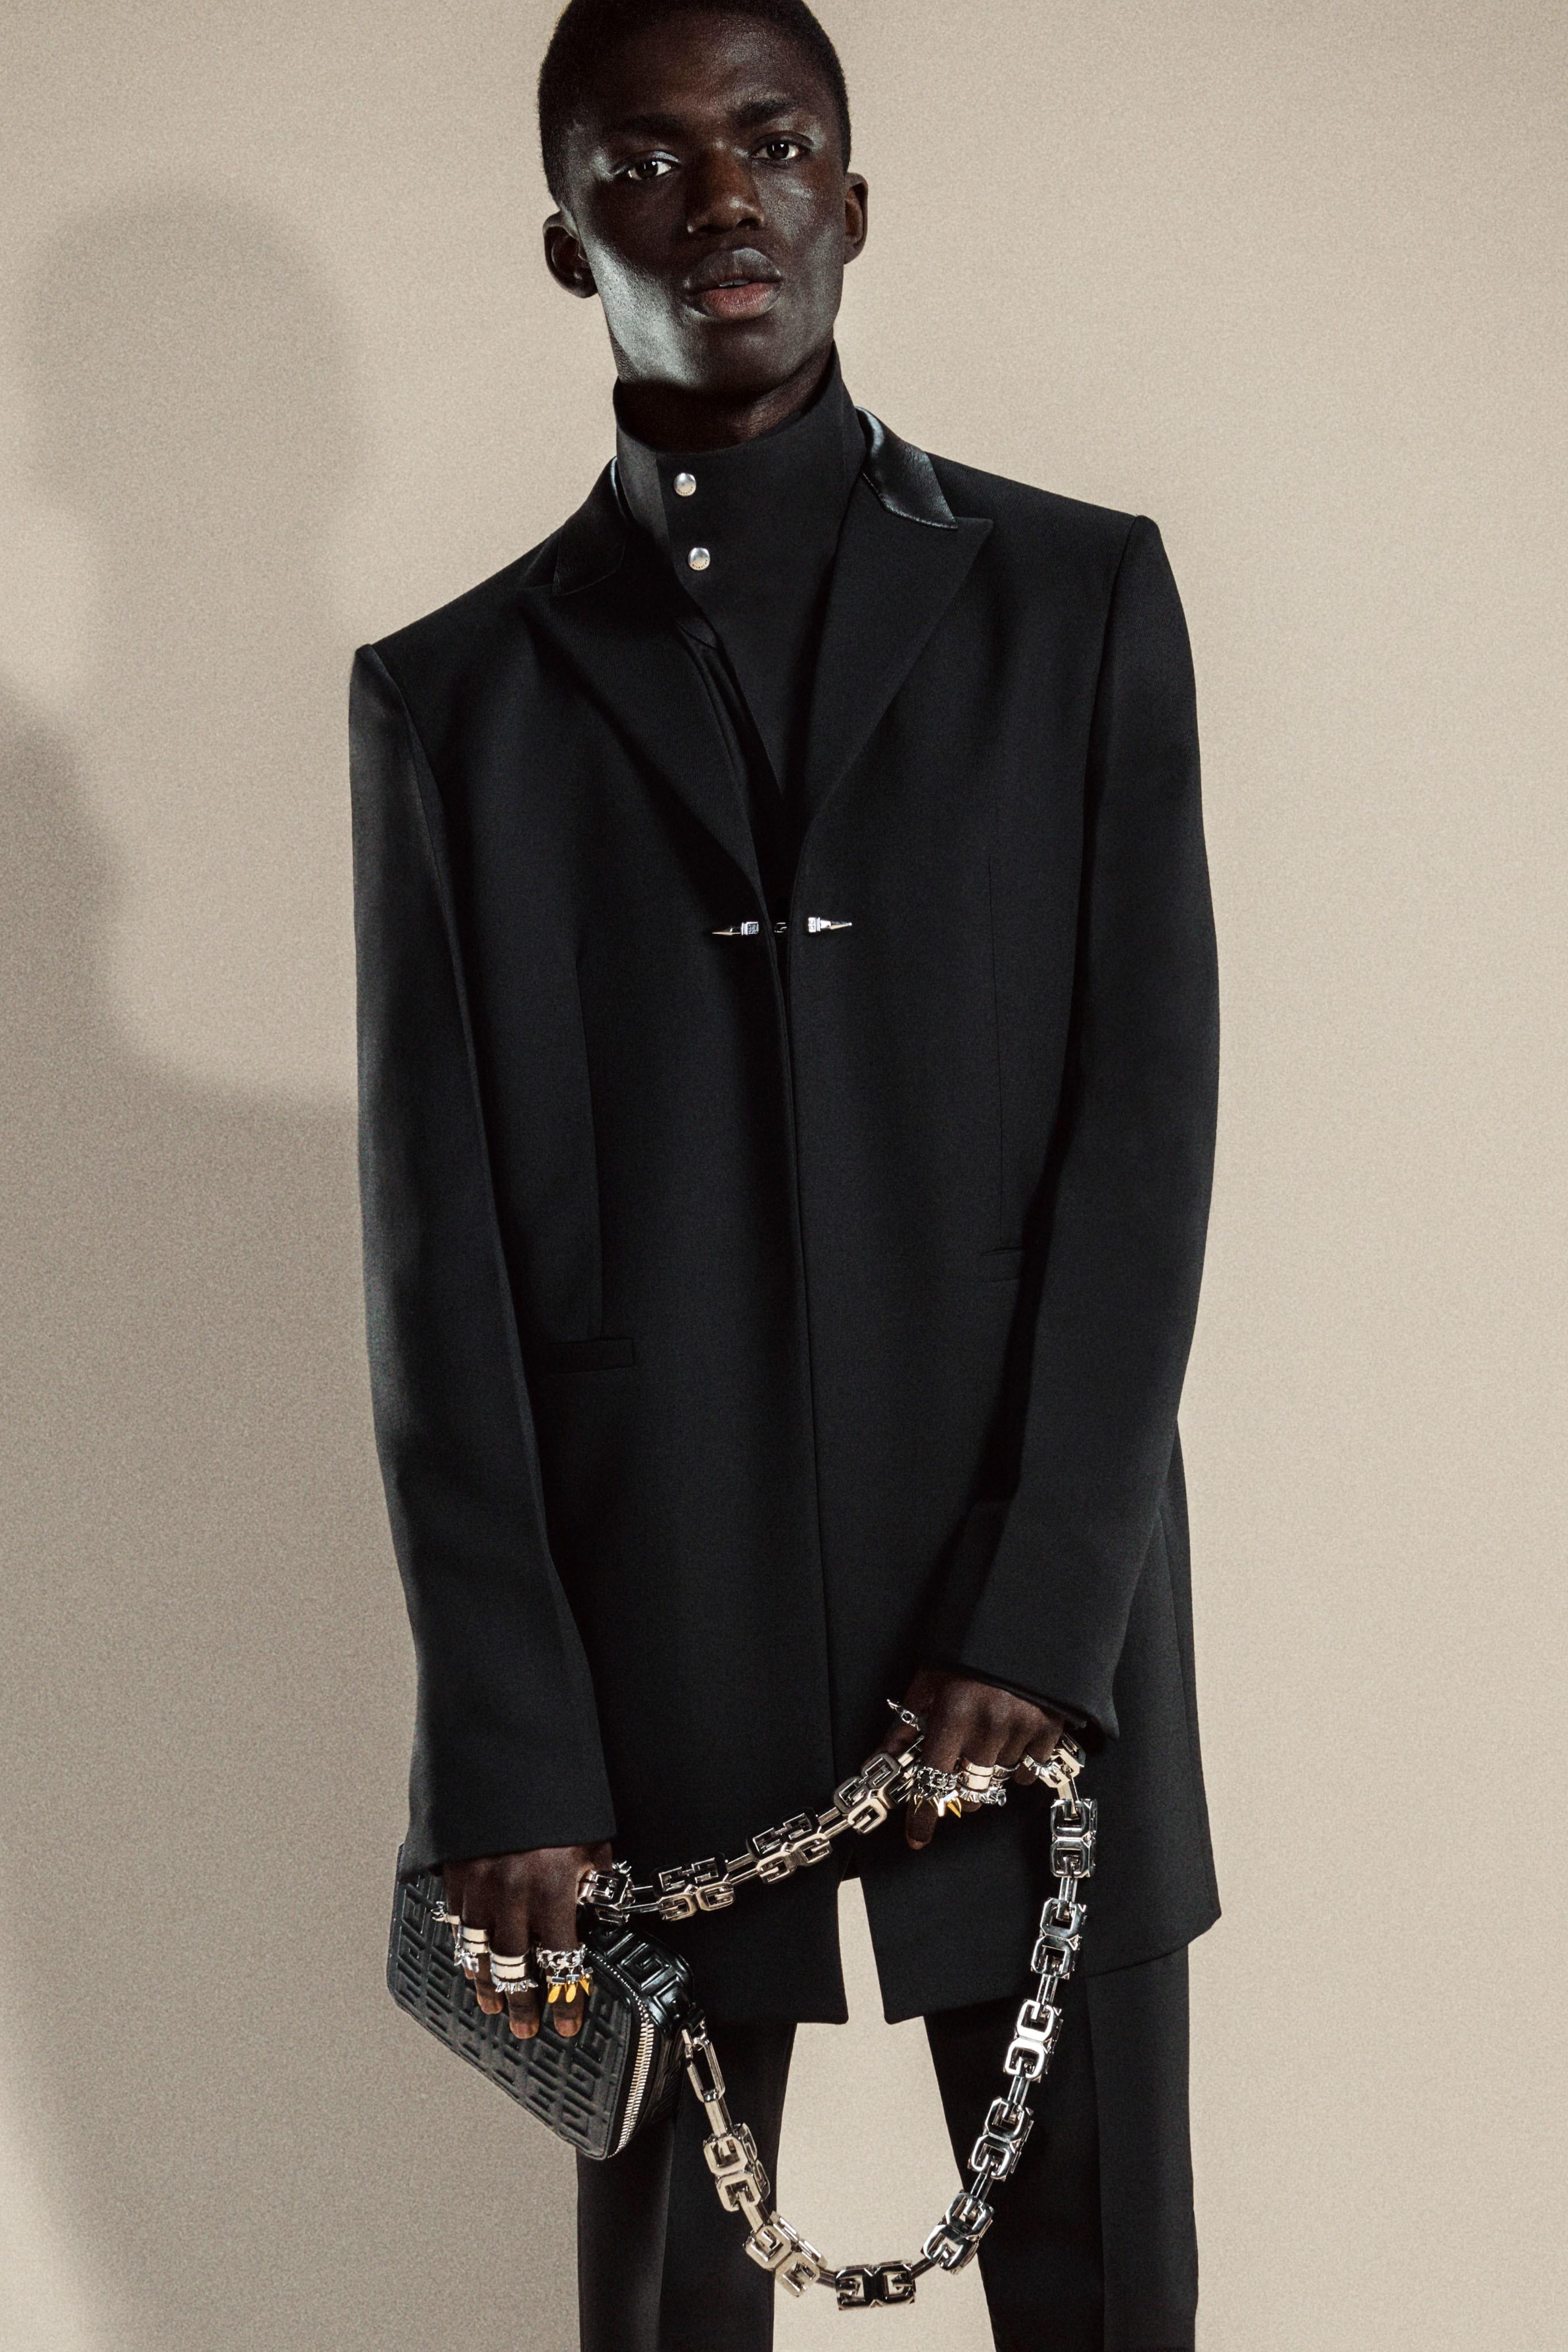 00002-Givenchy-Pre-Fall-21